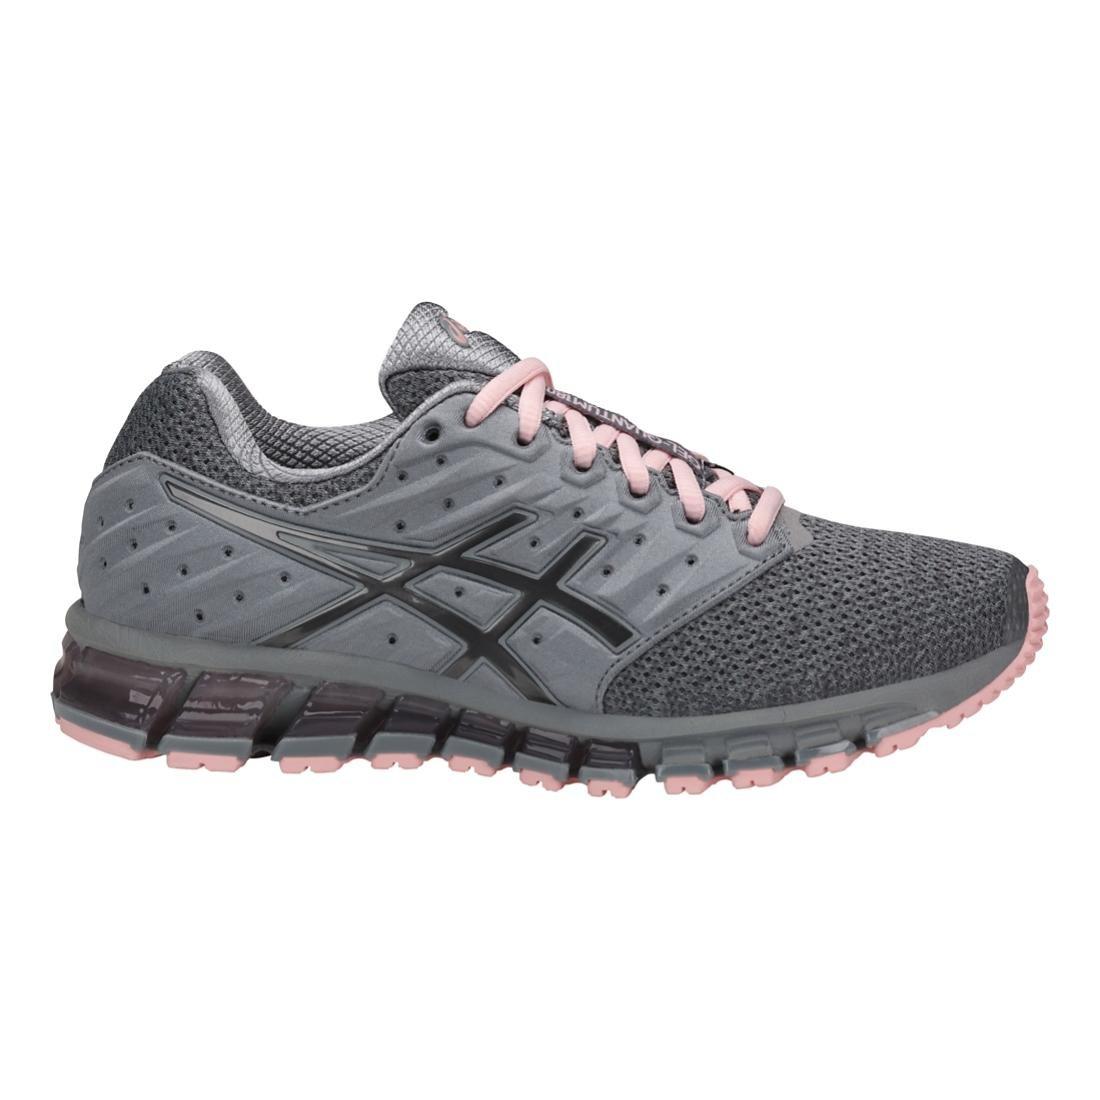 ASICS Womens Gel-Quantum 180 2 MX Running Shoe, Stone Grey/Carbon/Seashell Pink, Size 7.5